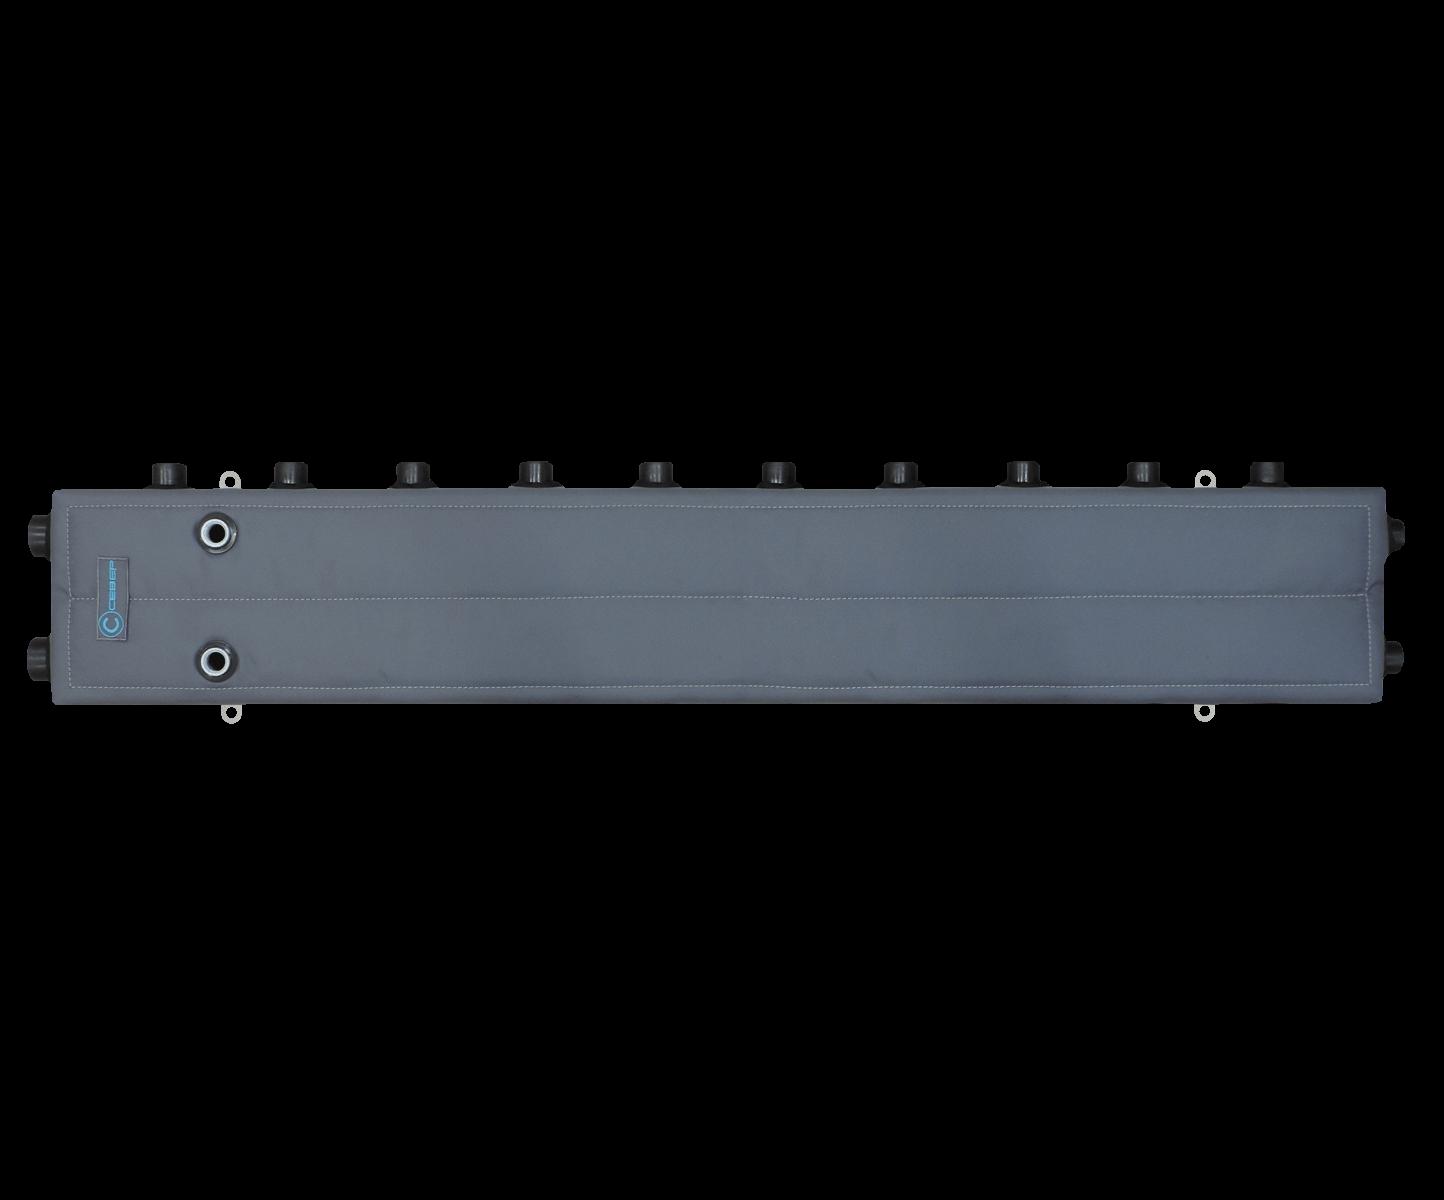 Теплоизоляция, теплоизоляционный чехол для гидрообвязки Север КМ6